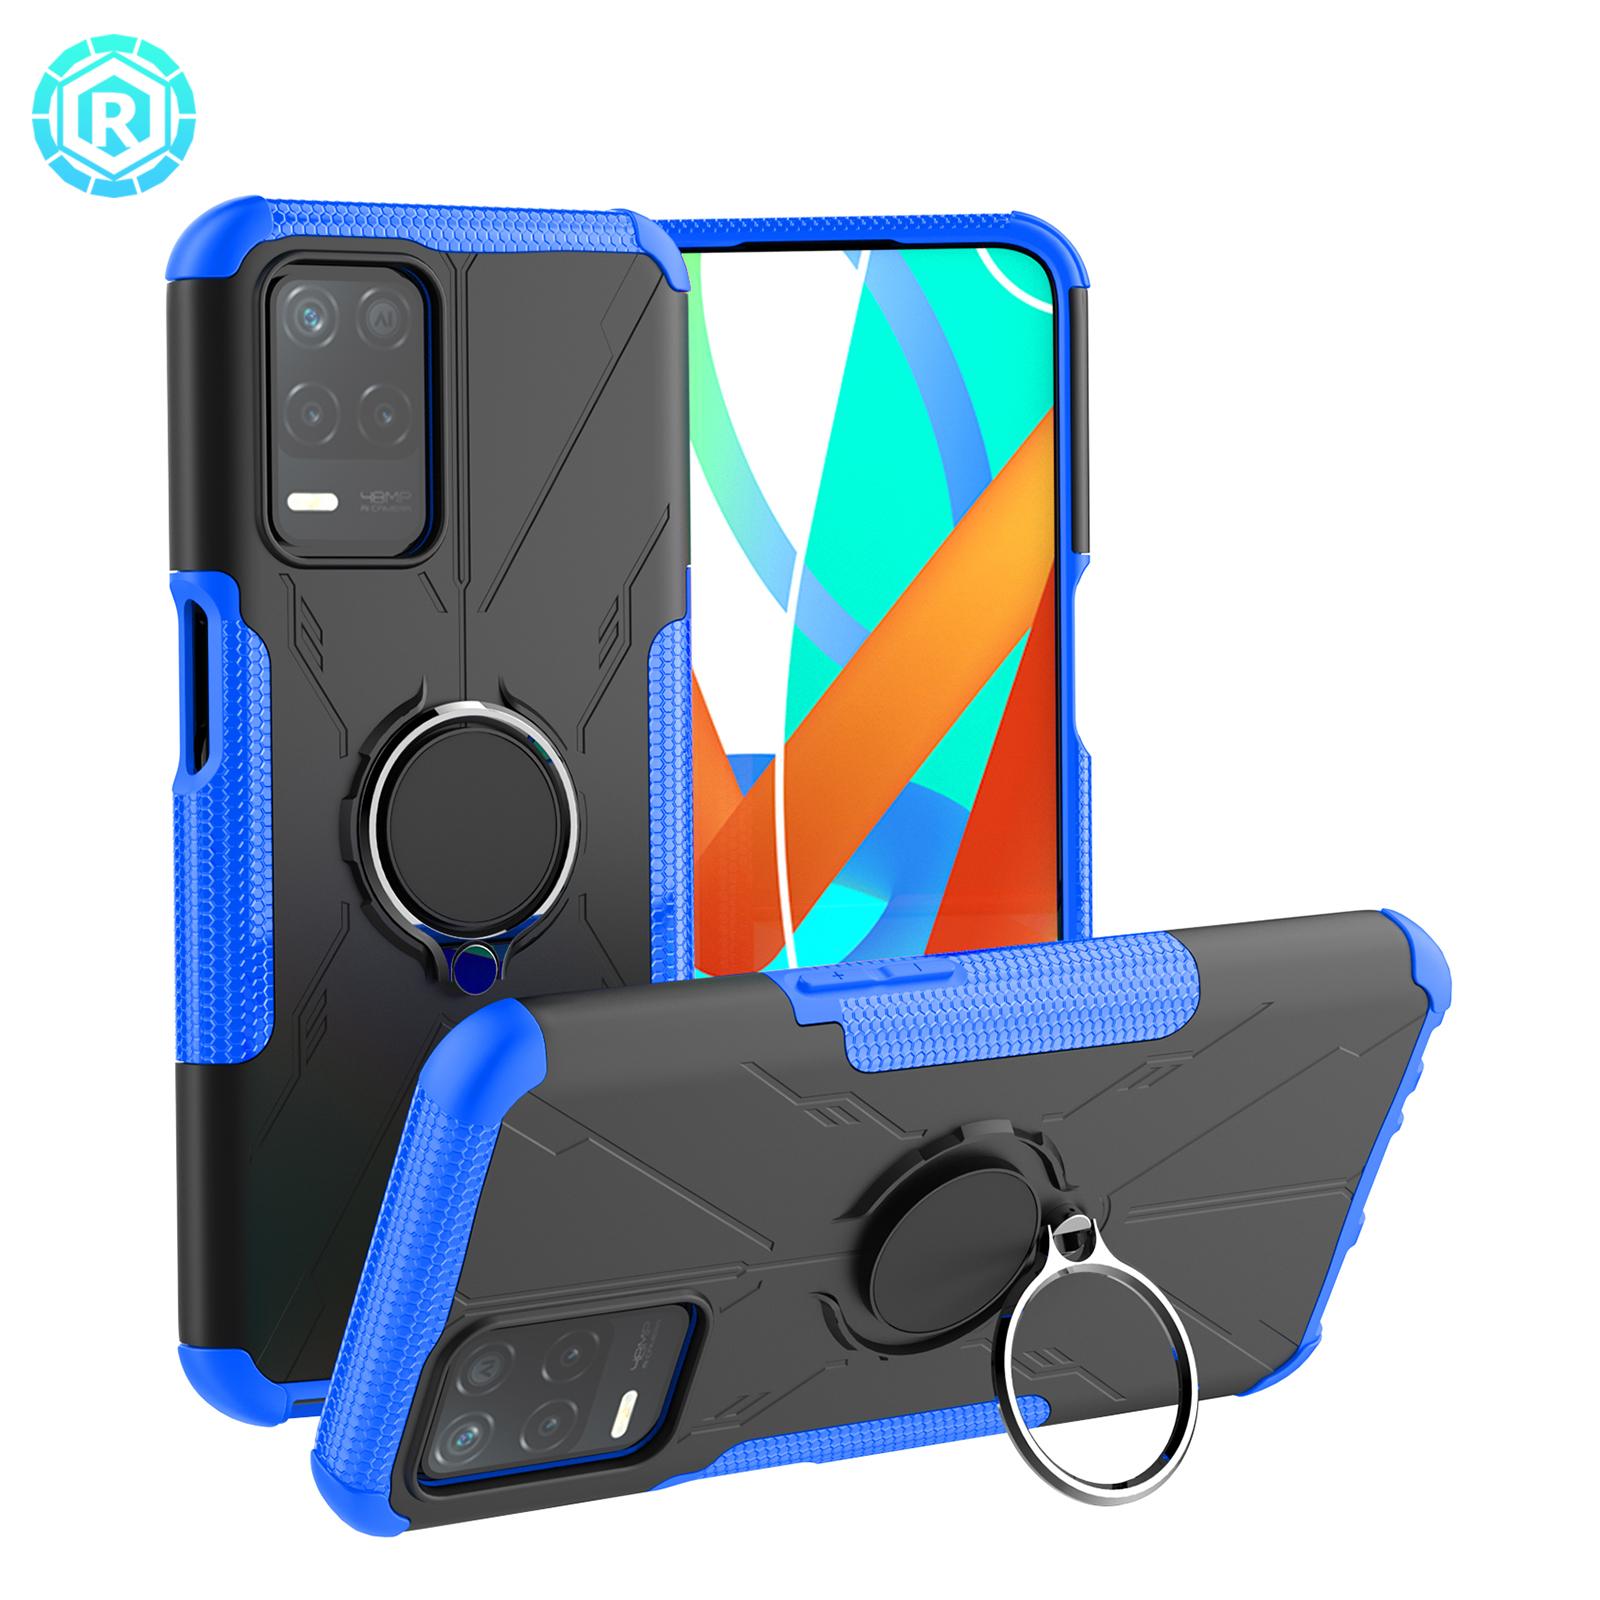 Mecha Phone Case For Realme V13 5G